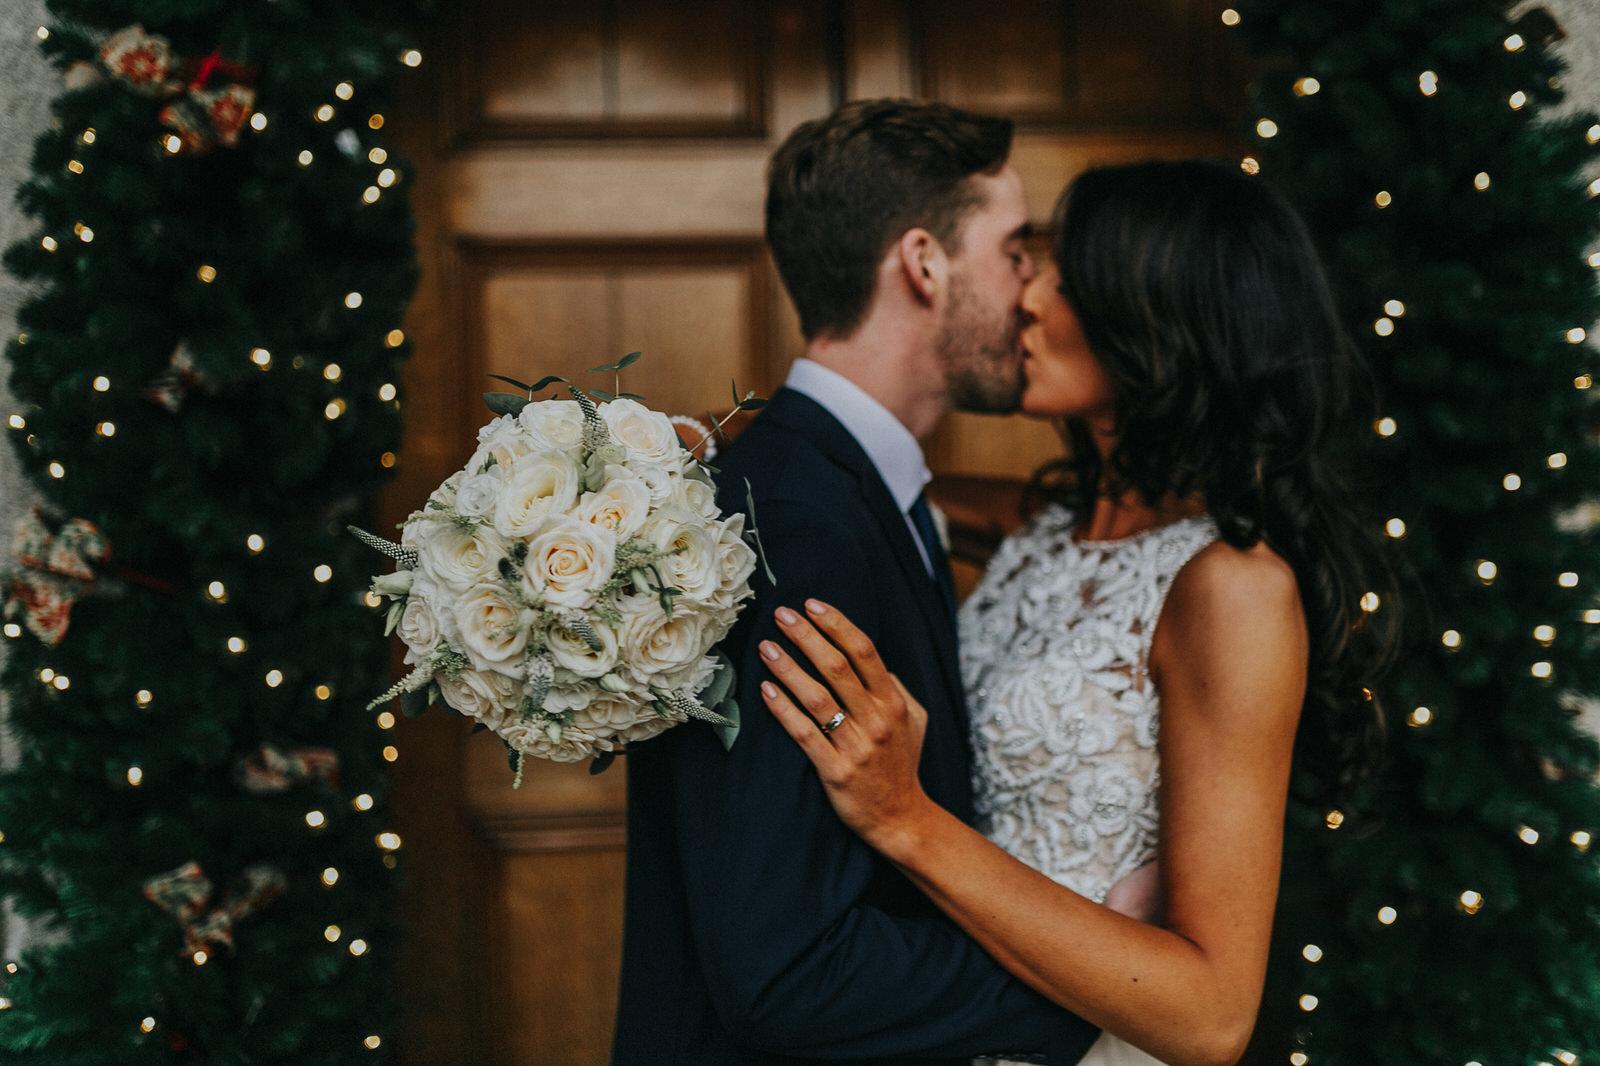 Roger_Kenny_wedding_photographer_467.jpg